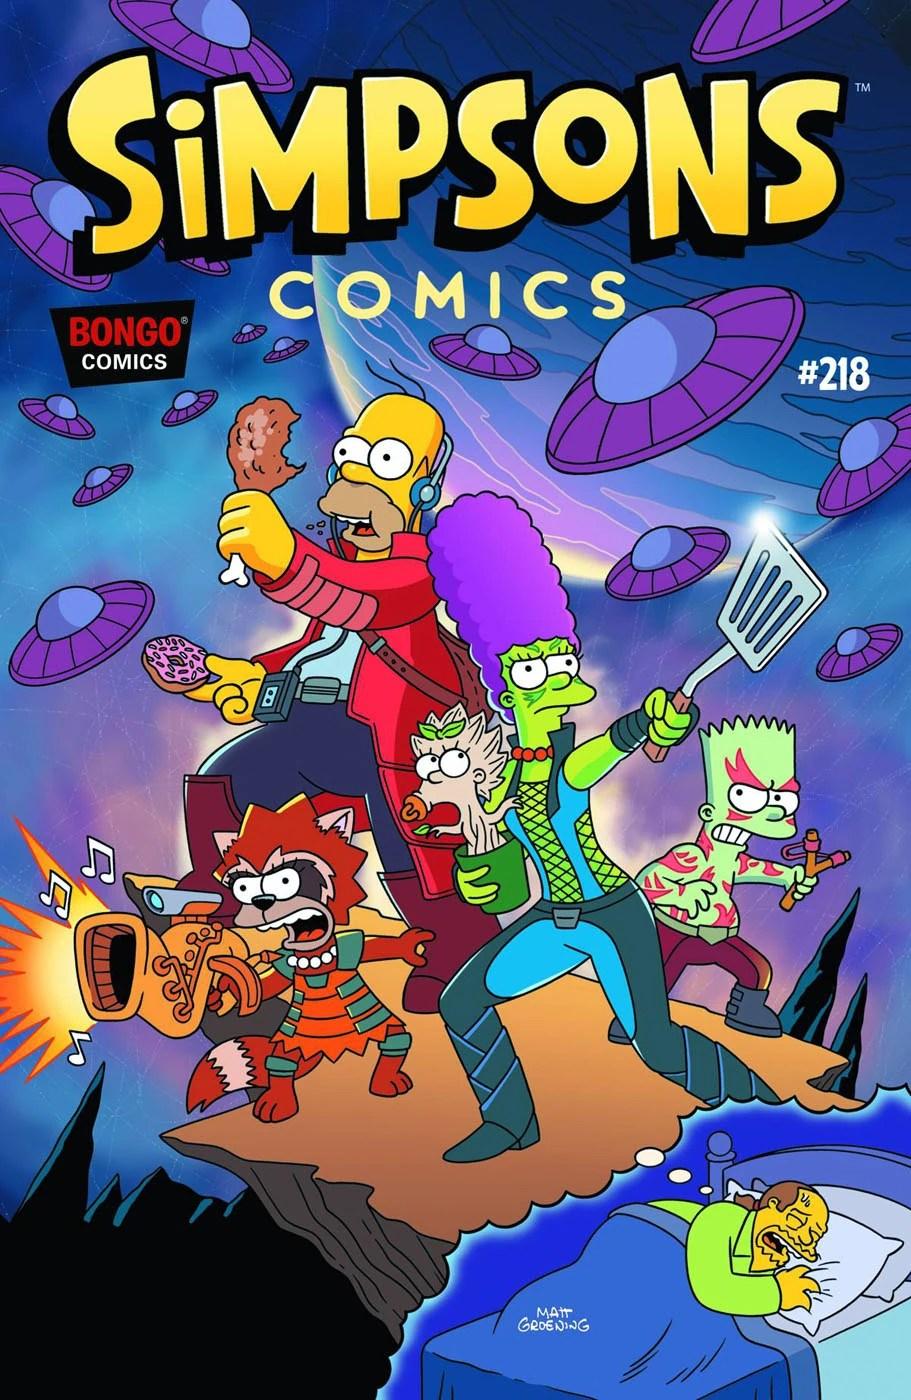 Gravity Falls Wallpaper Dump Simpsons Comics 218 Simpsons Wiki Fandom Powered By Wikia